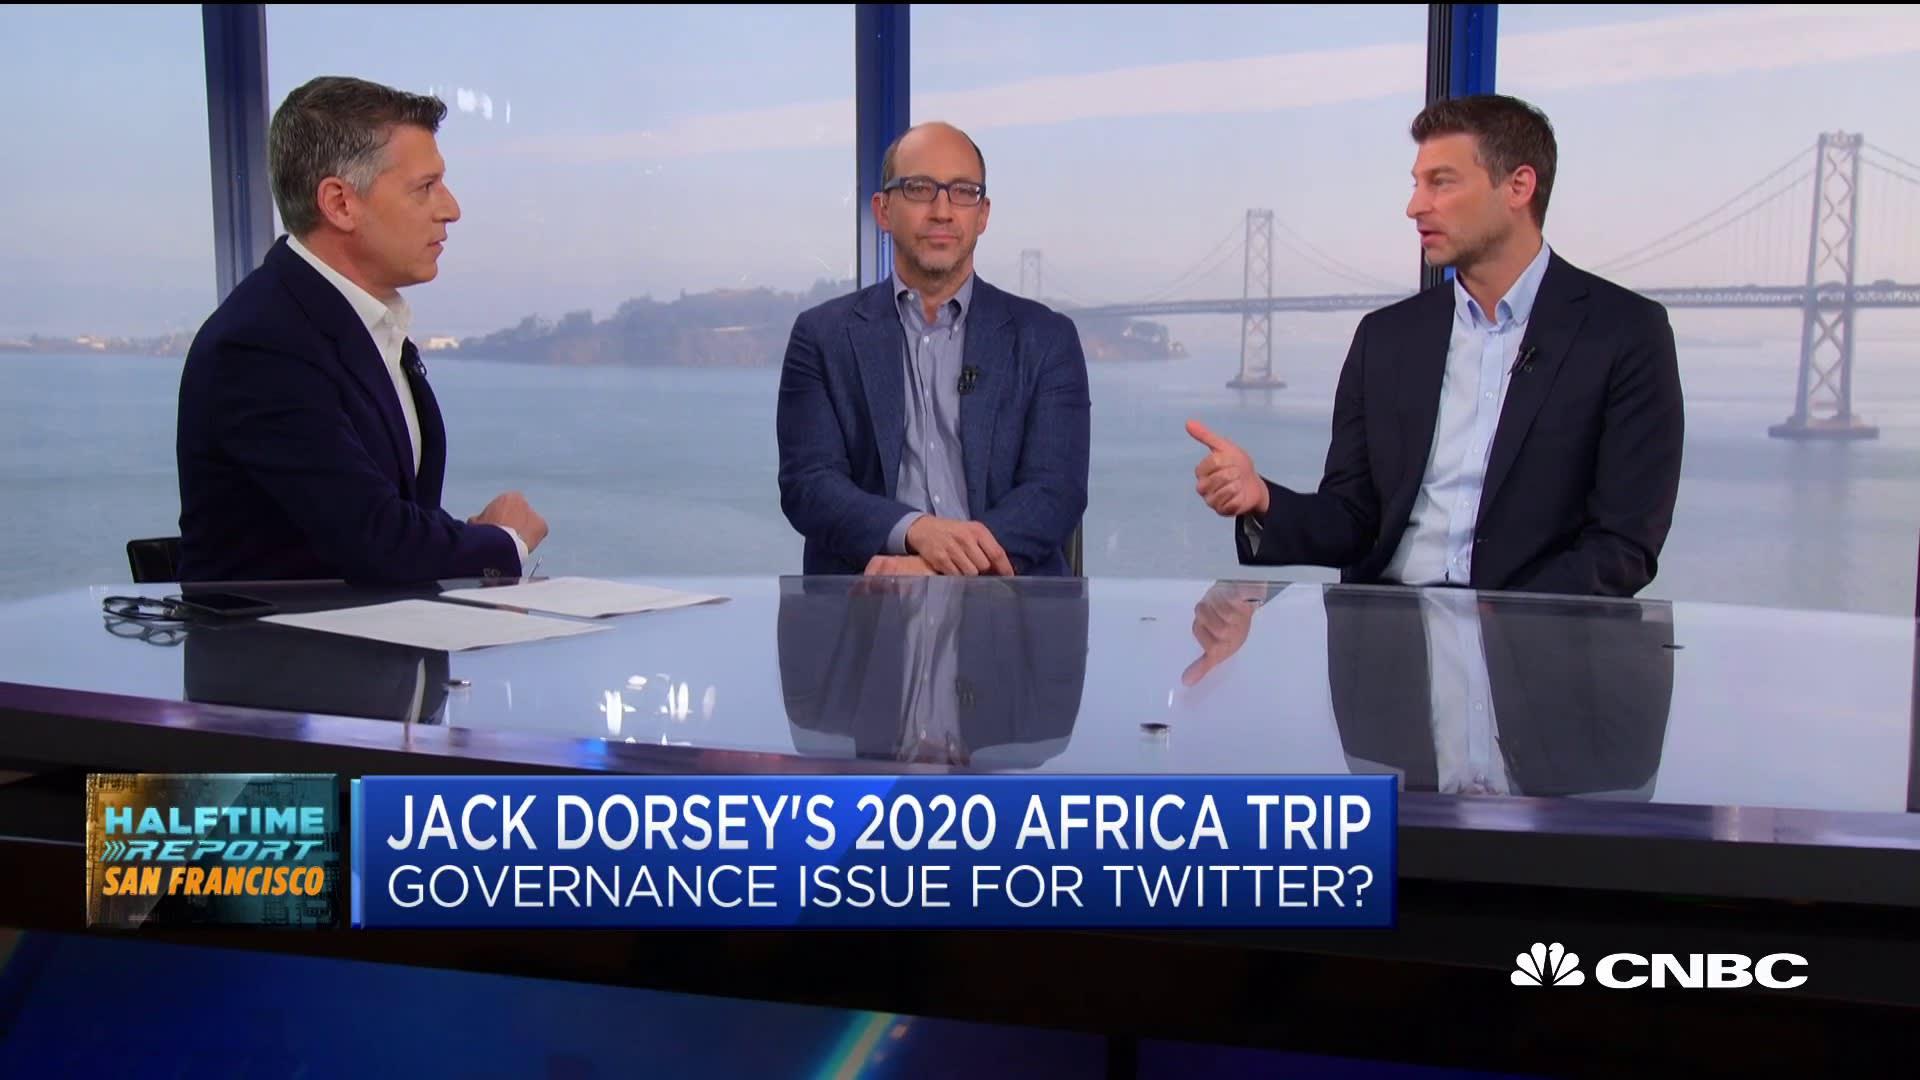 Jack Dorsey Follows Tech Companies Investors In Africa Interest